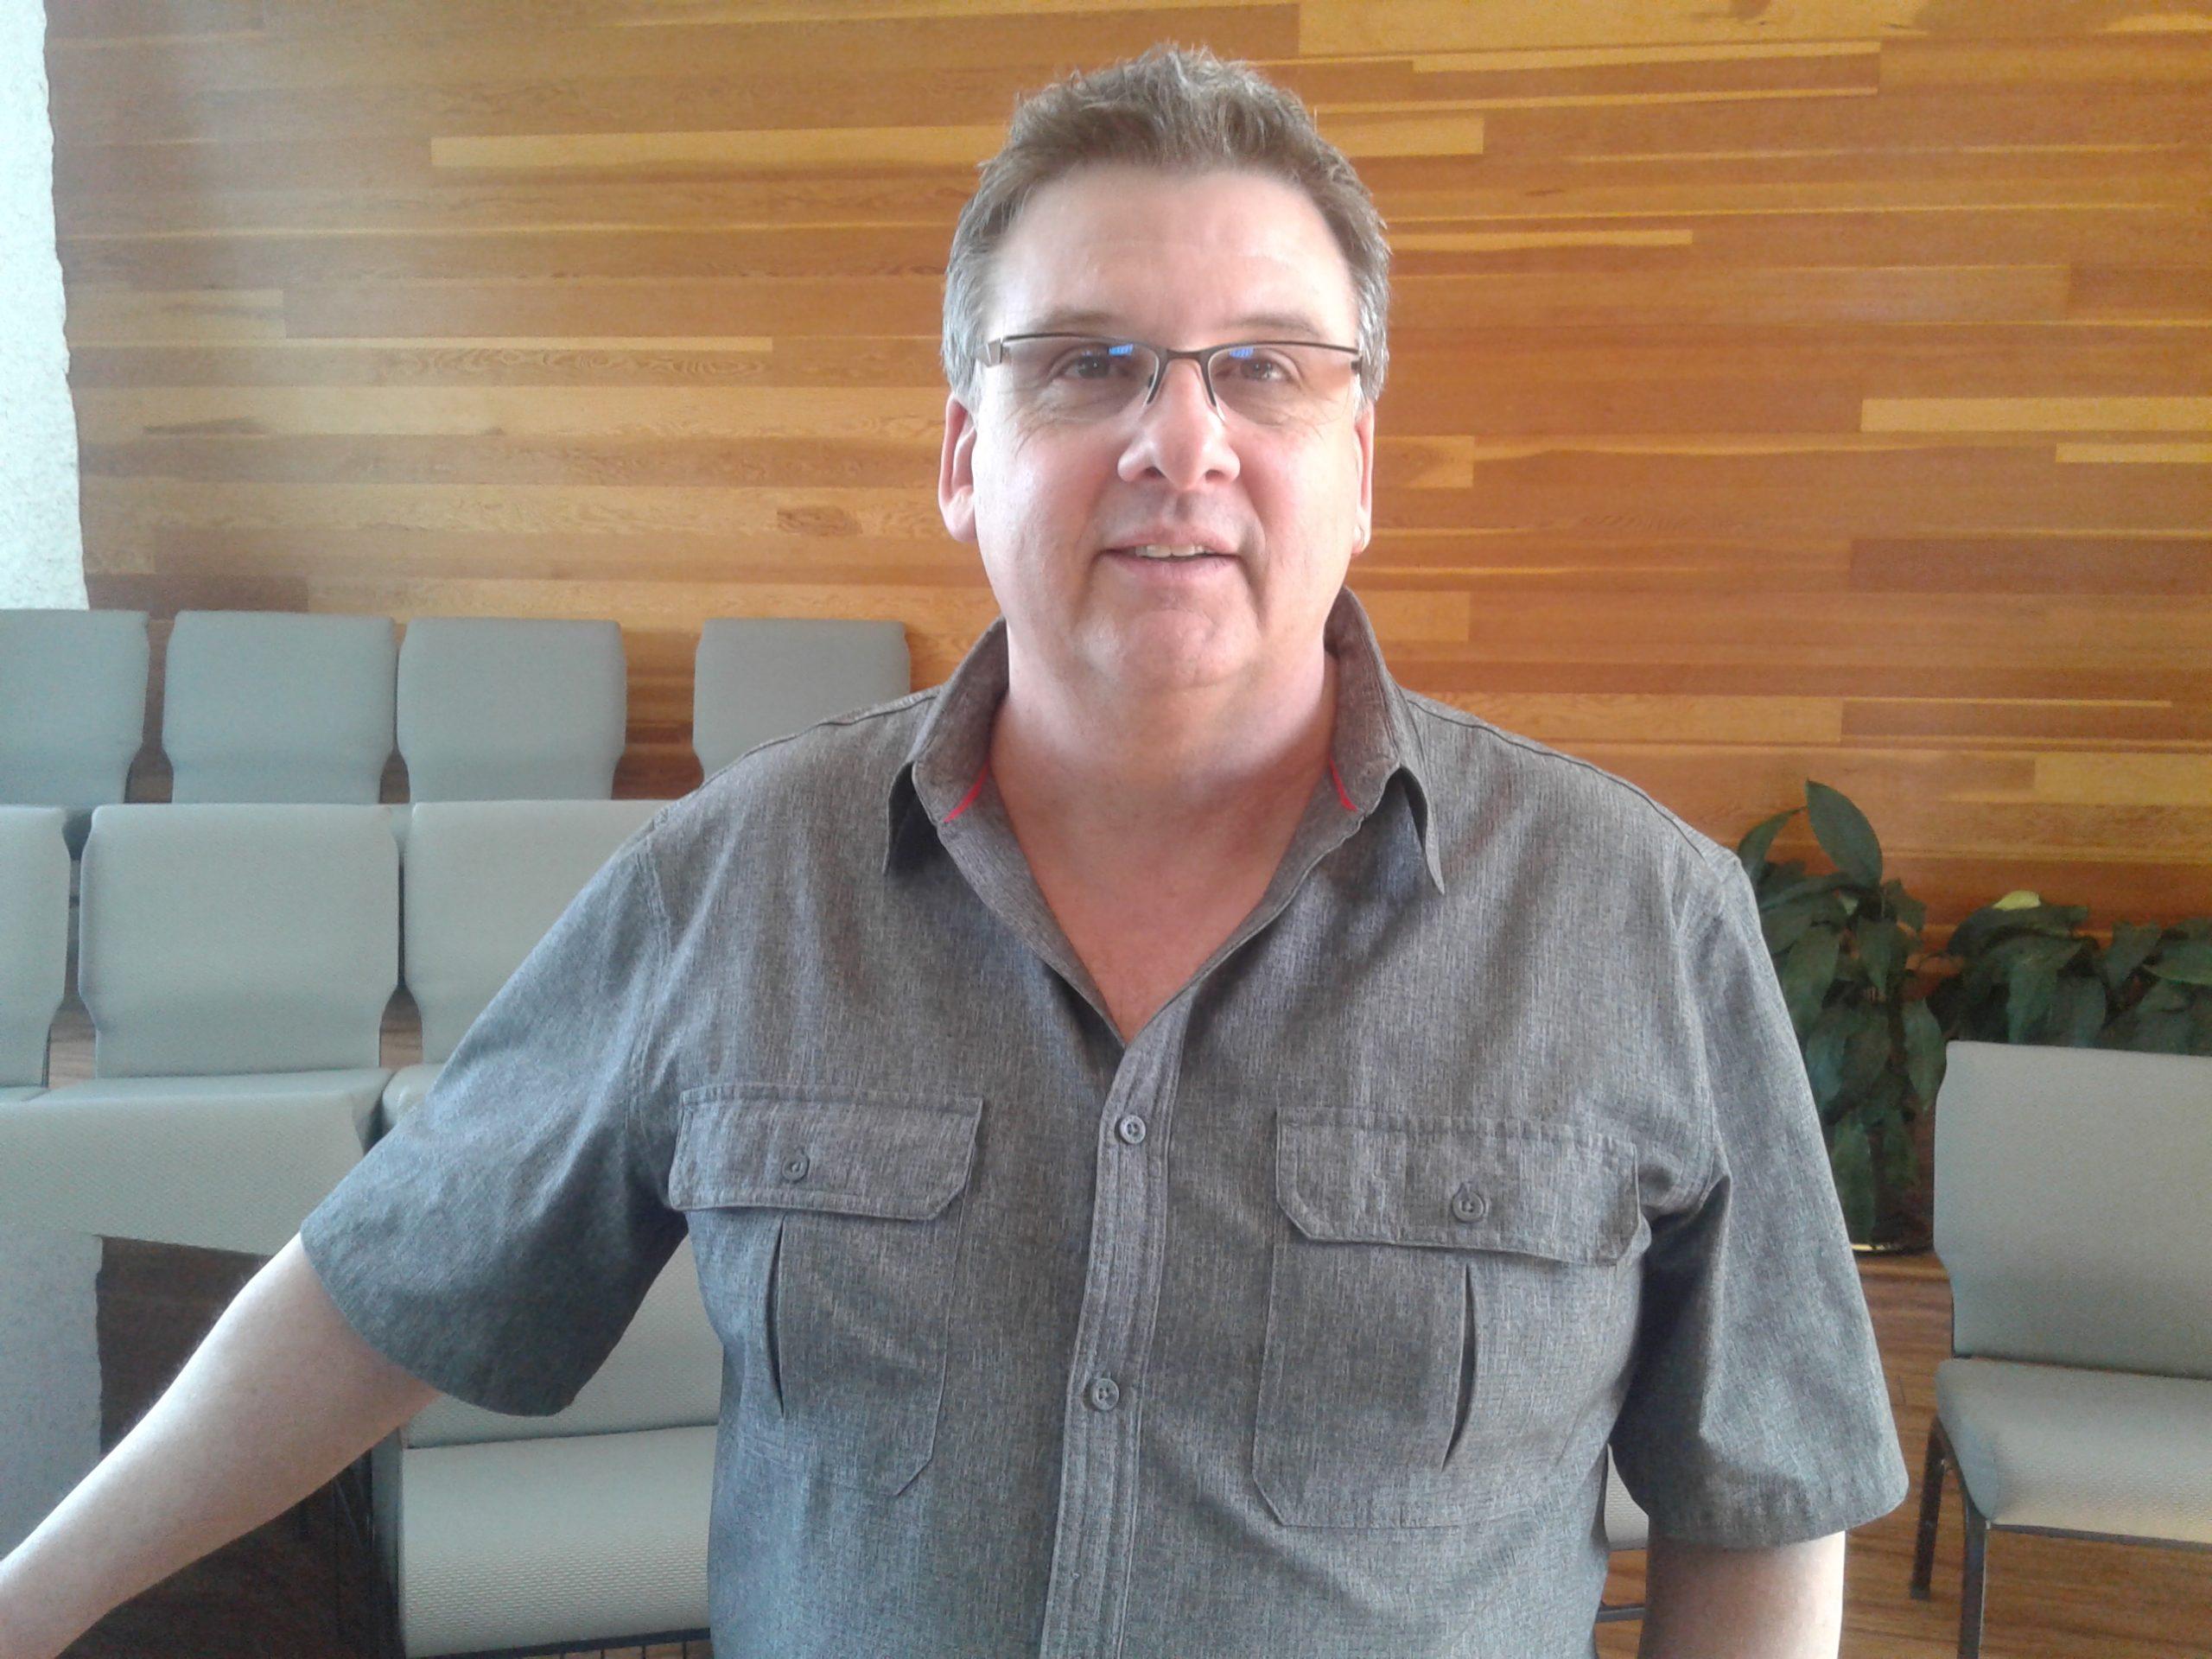 Rev. Mark Green